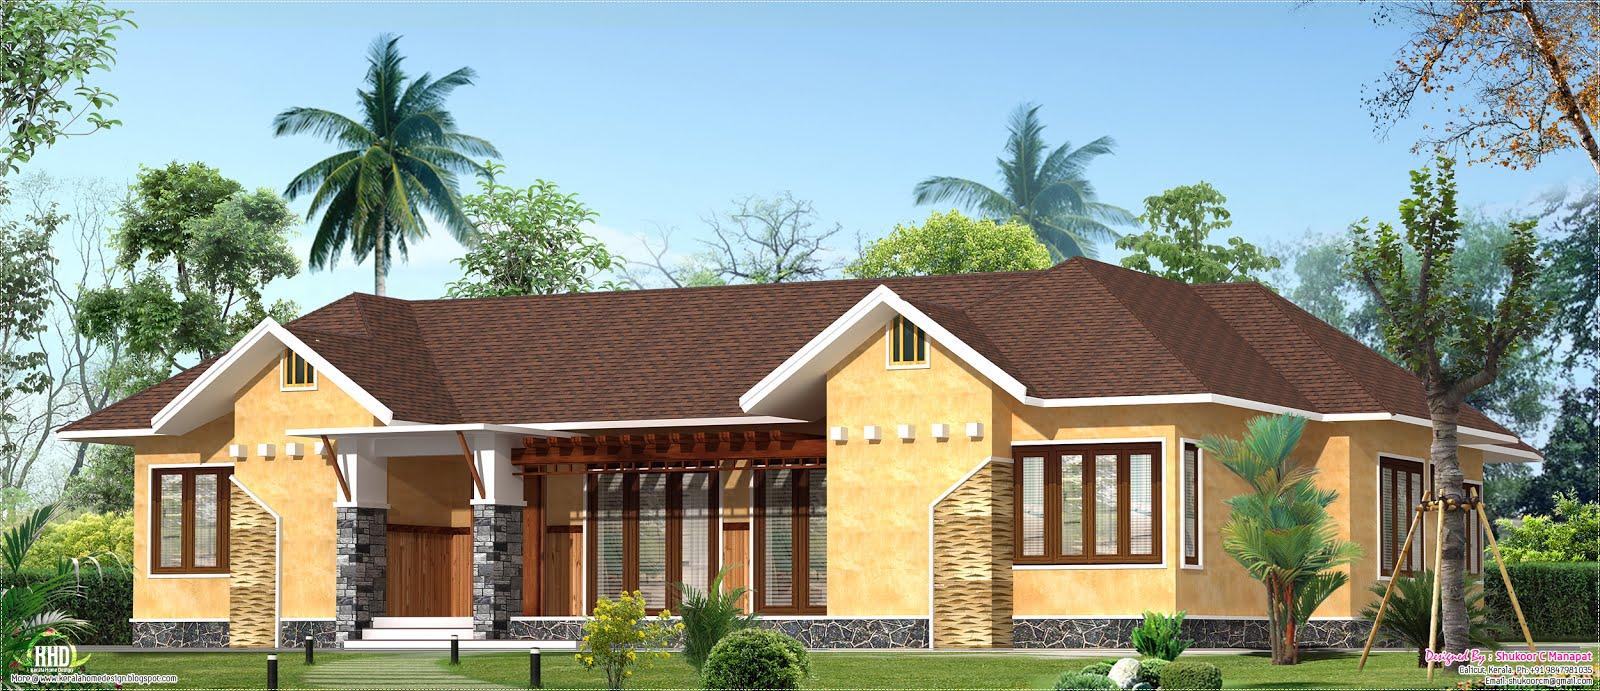 Eco Friendly Home Design India | Awesome Home